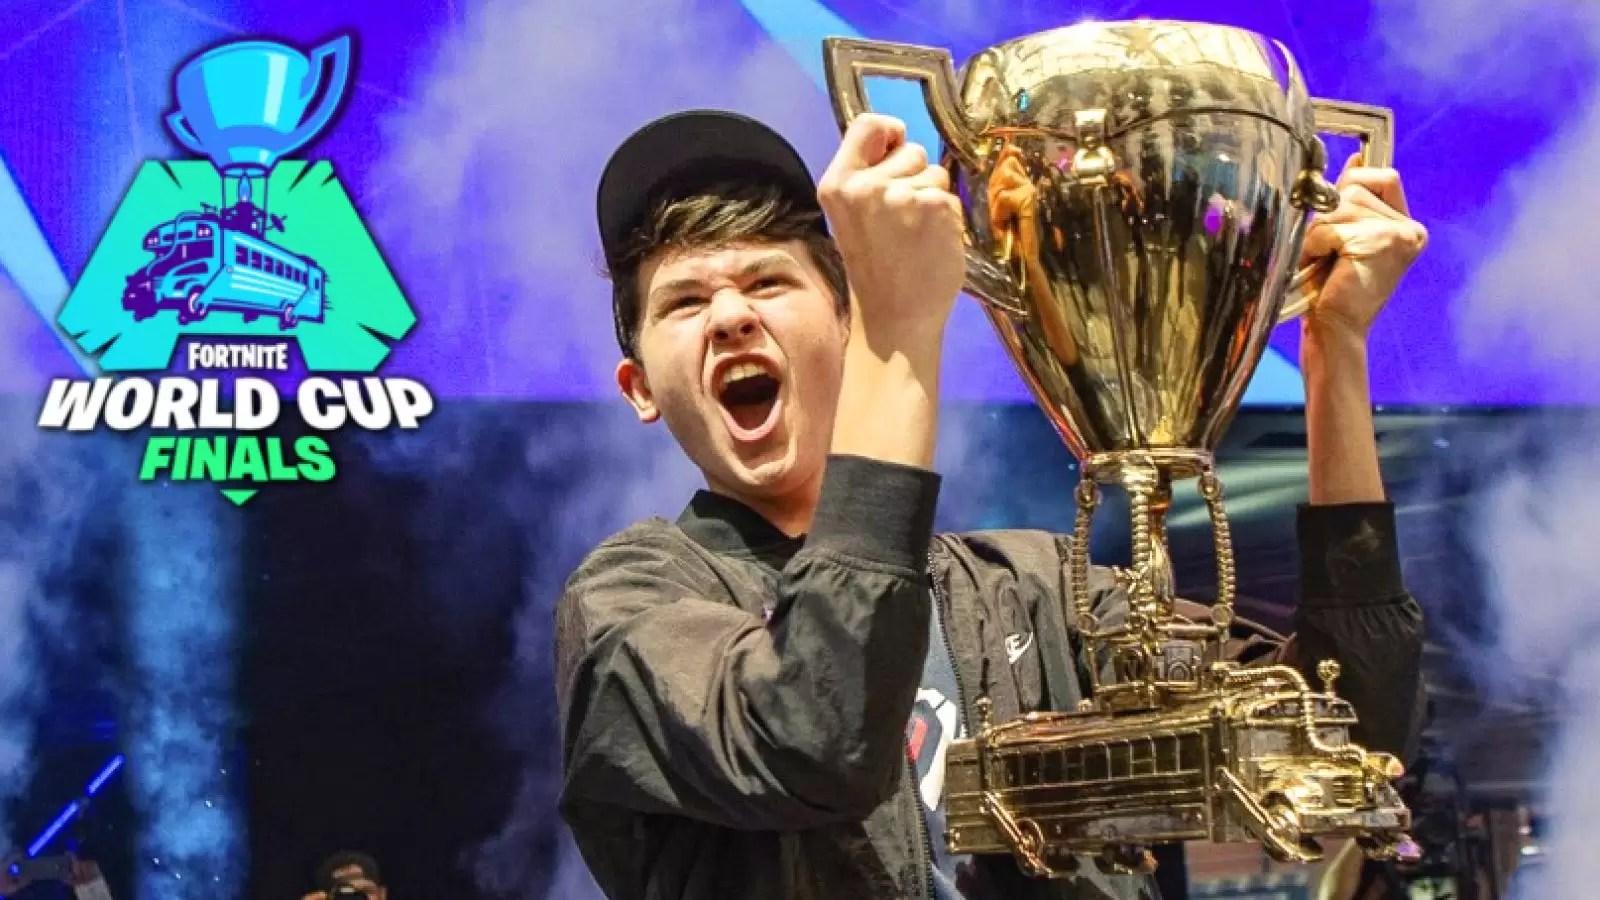 Šesnaestogodišnjak je šampion prvog Fortnite Svetskog Prvenstva